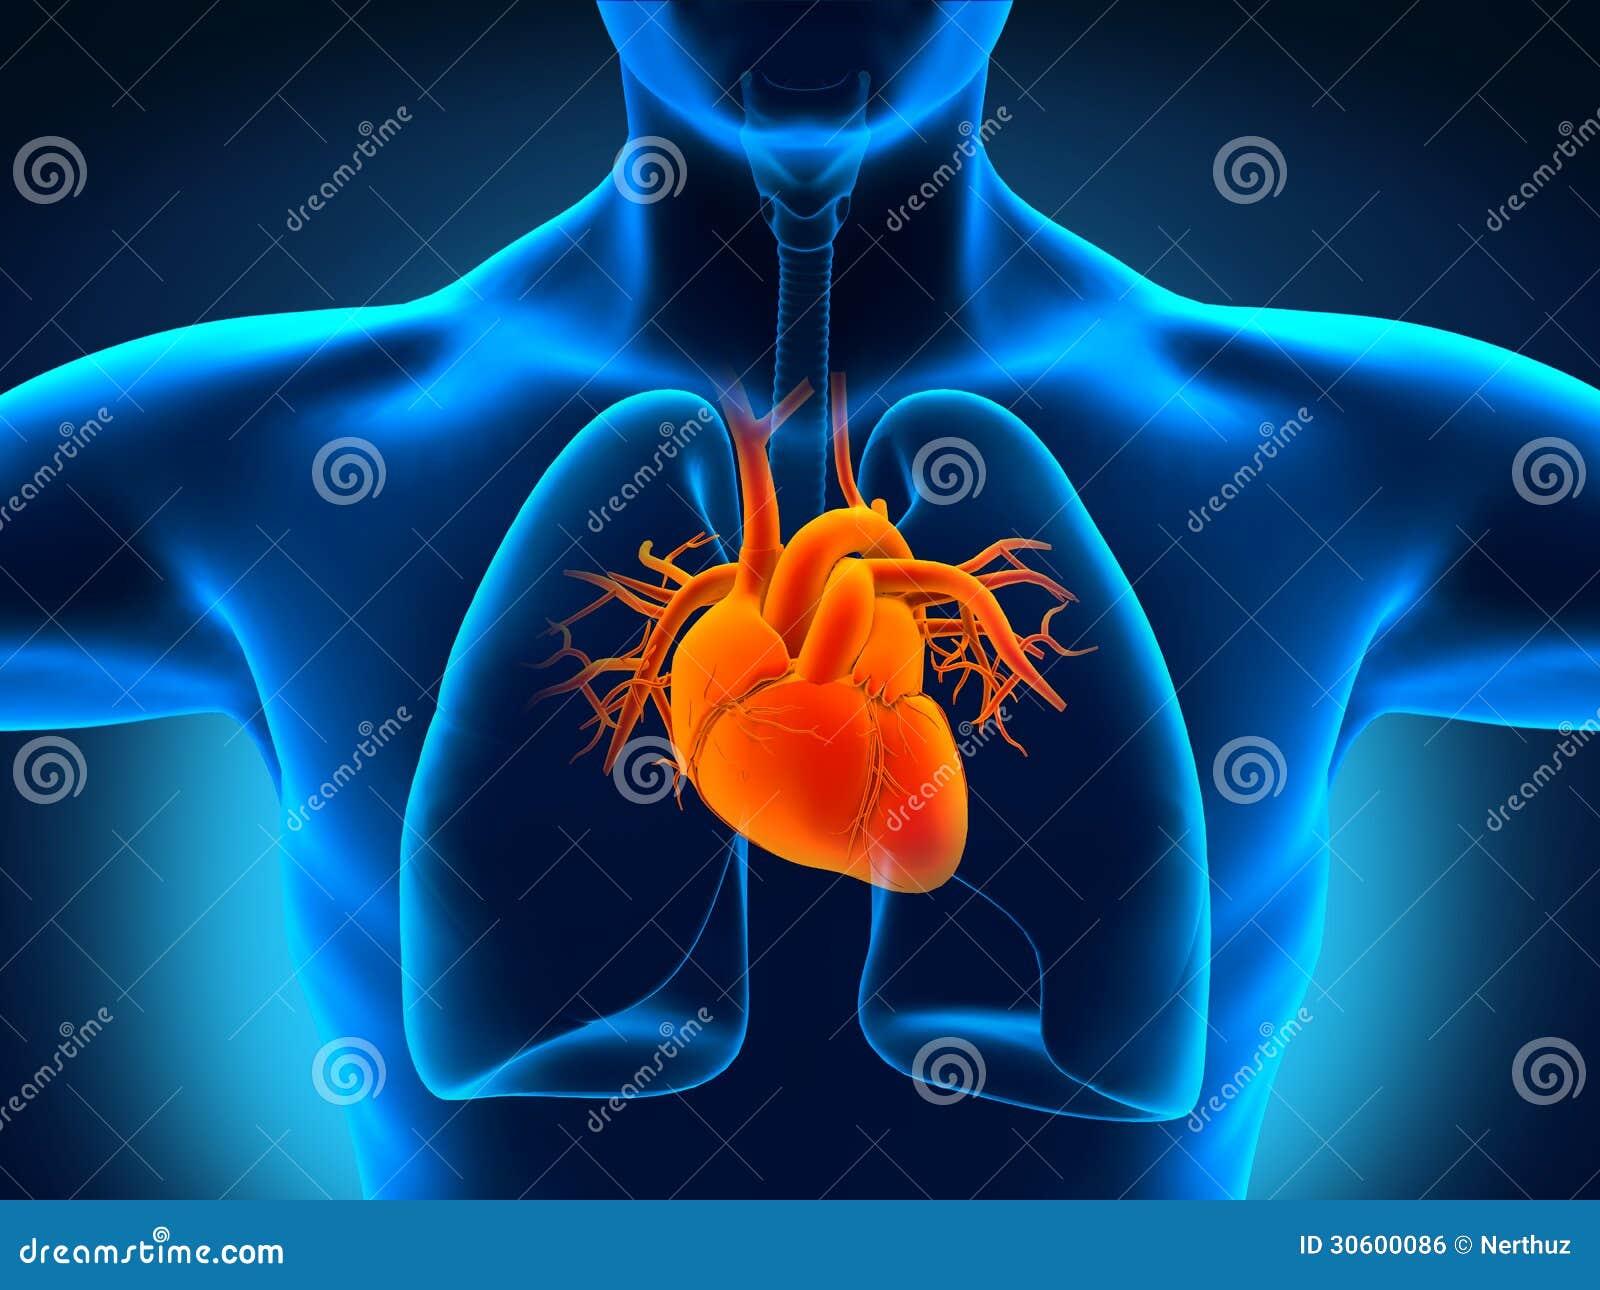 Human Heart Anatomy Royalty Free Stock Image - Image: 30600086